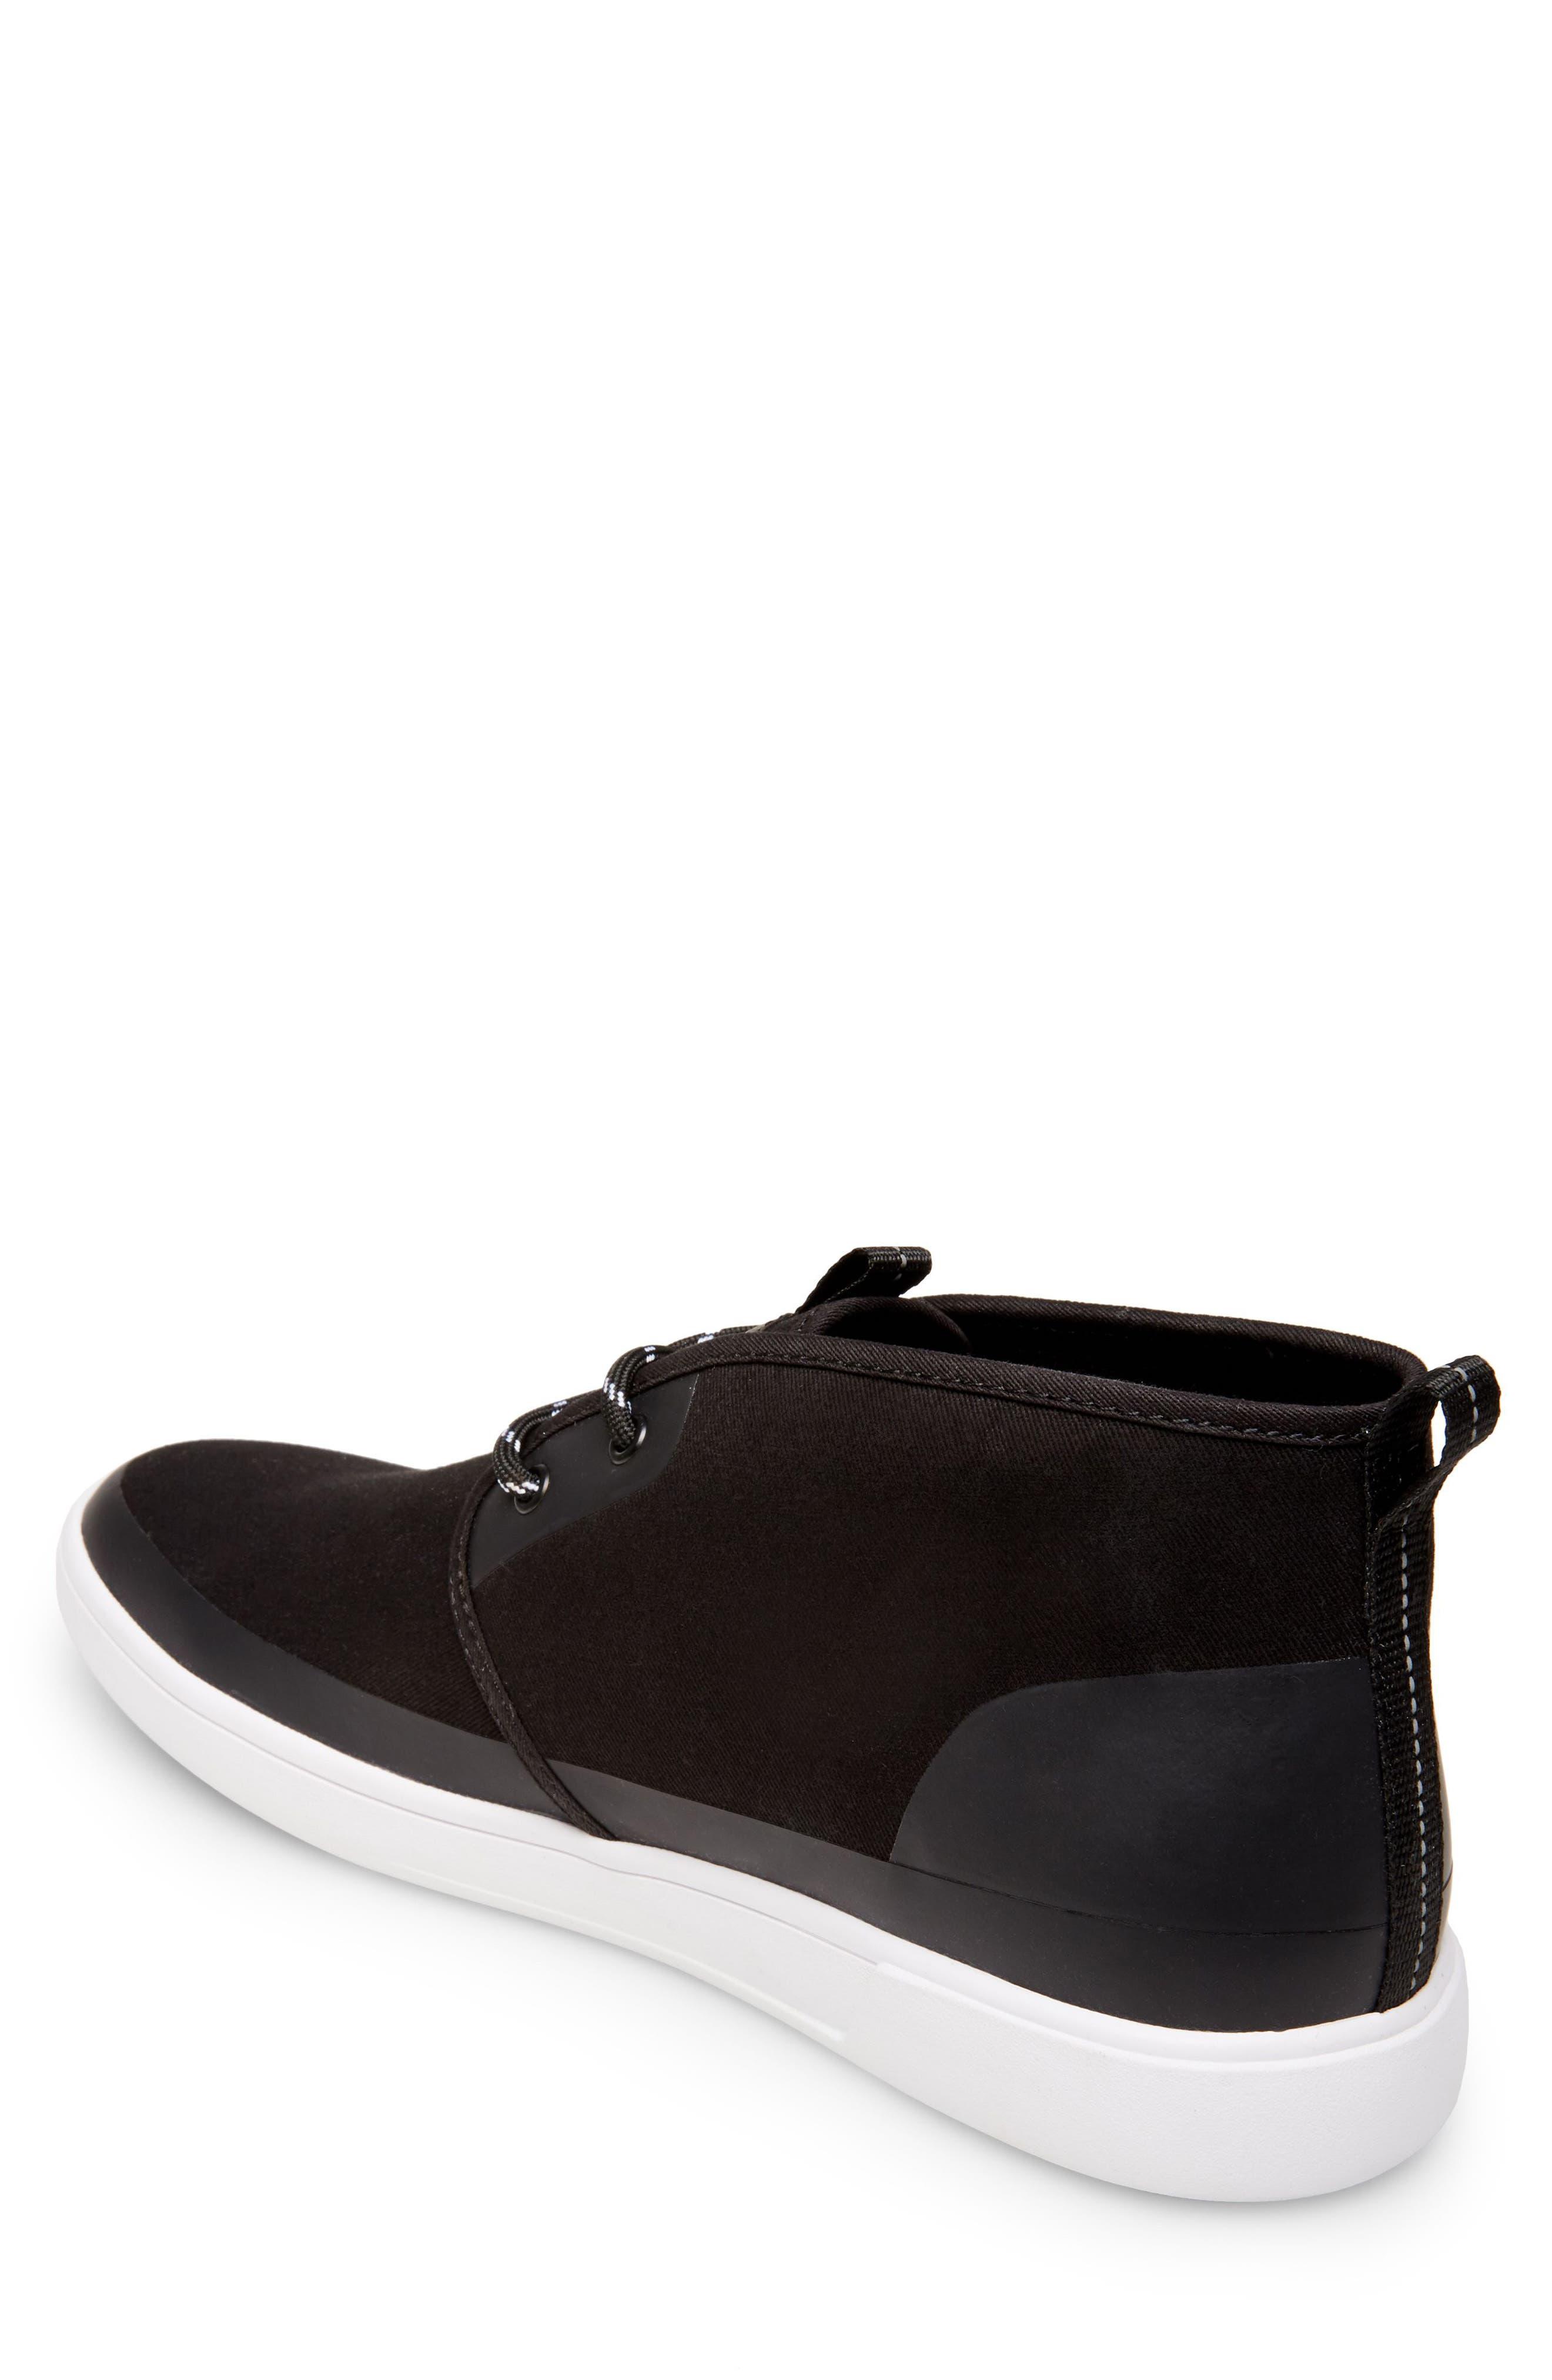 Franklyn Chukka Sneaker,                             Alternate thumbnail 2, color,                             Black Fabric